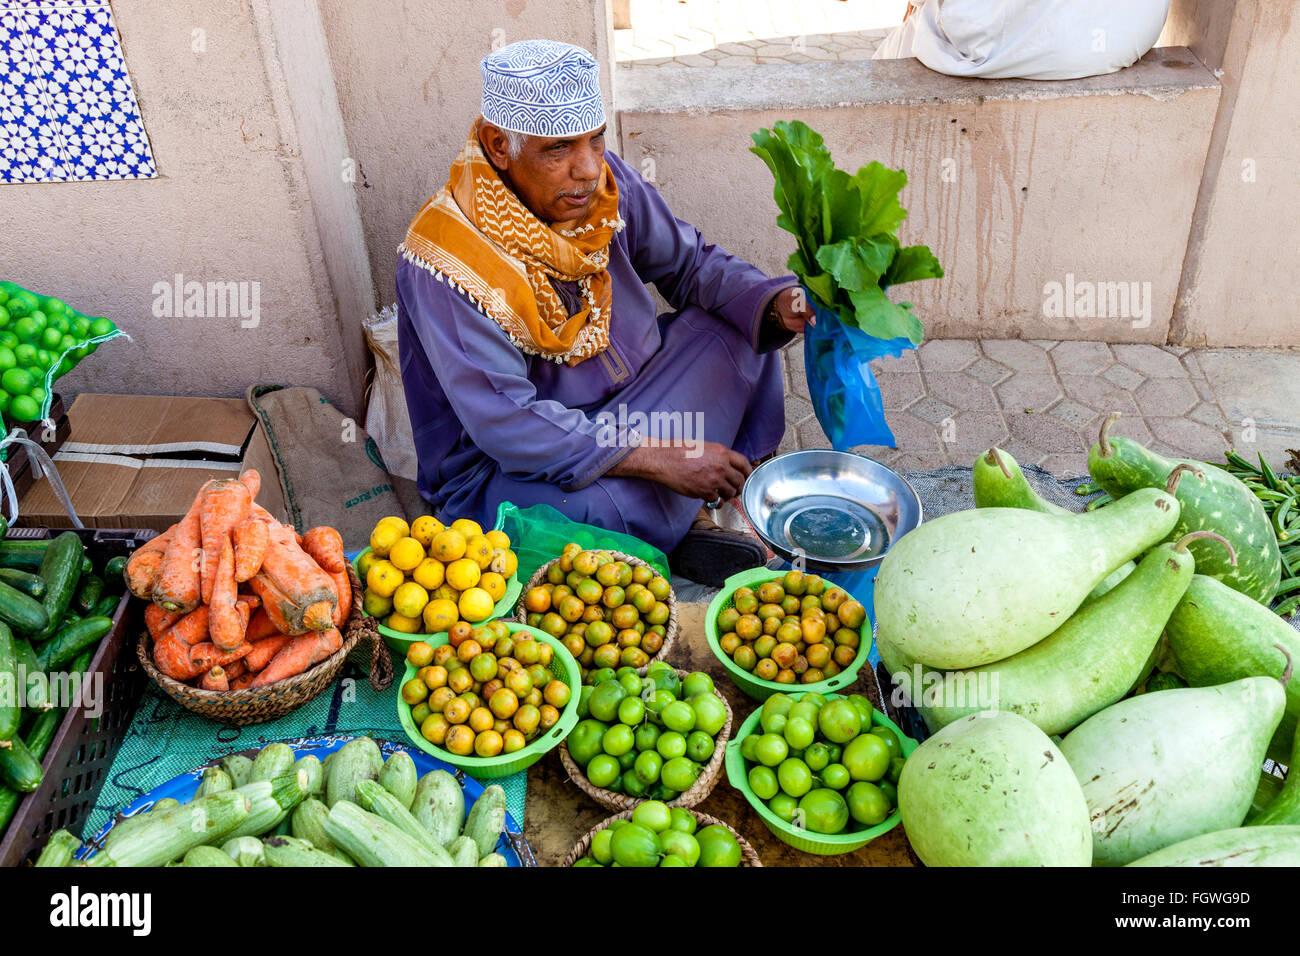 Mercato di frutta e verdura a Nizwa Souk, Nizwa, Ad Dakhiliyah Regione, Oman Immagini Stock